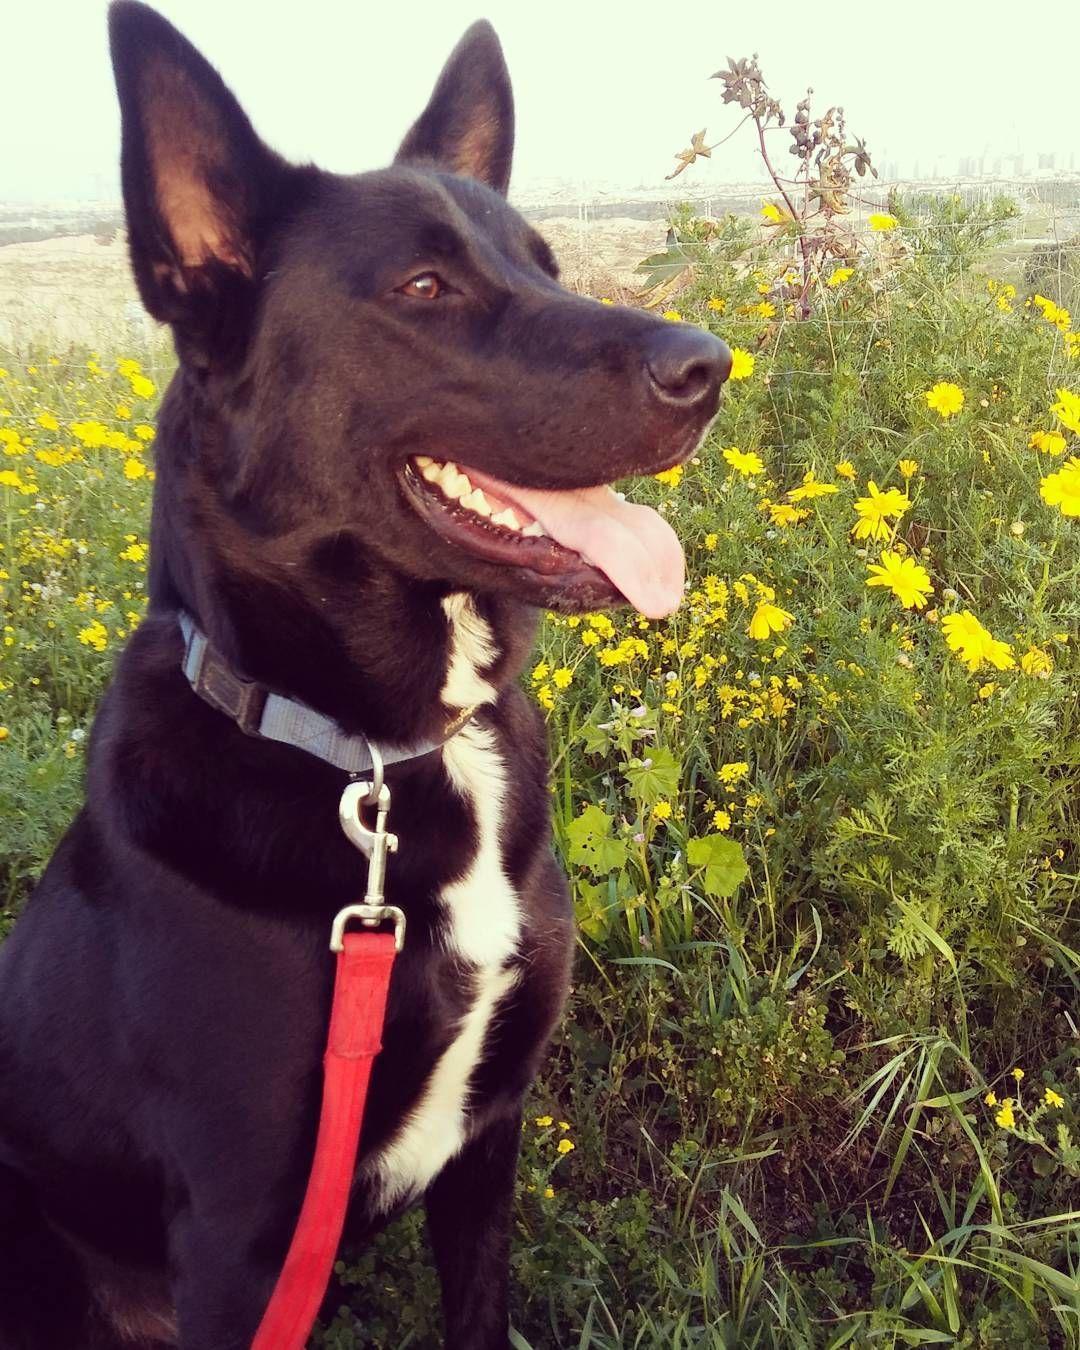 #smile#followme#dog #dogsofinstagram #dogs#puppy #gym #fitness #love #beautiful #life #lifestyle #fu...